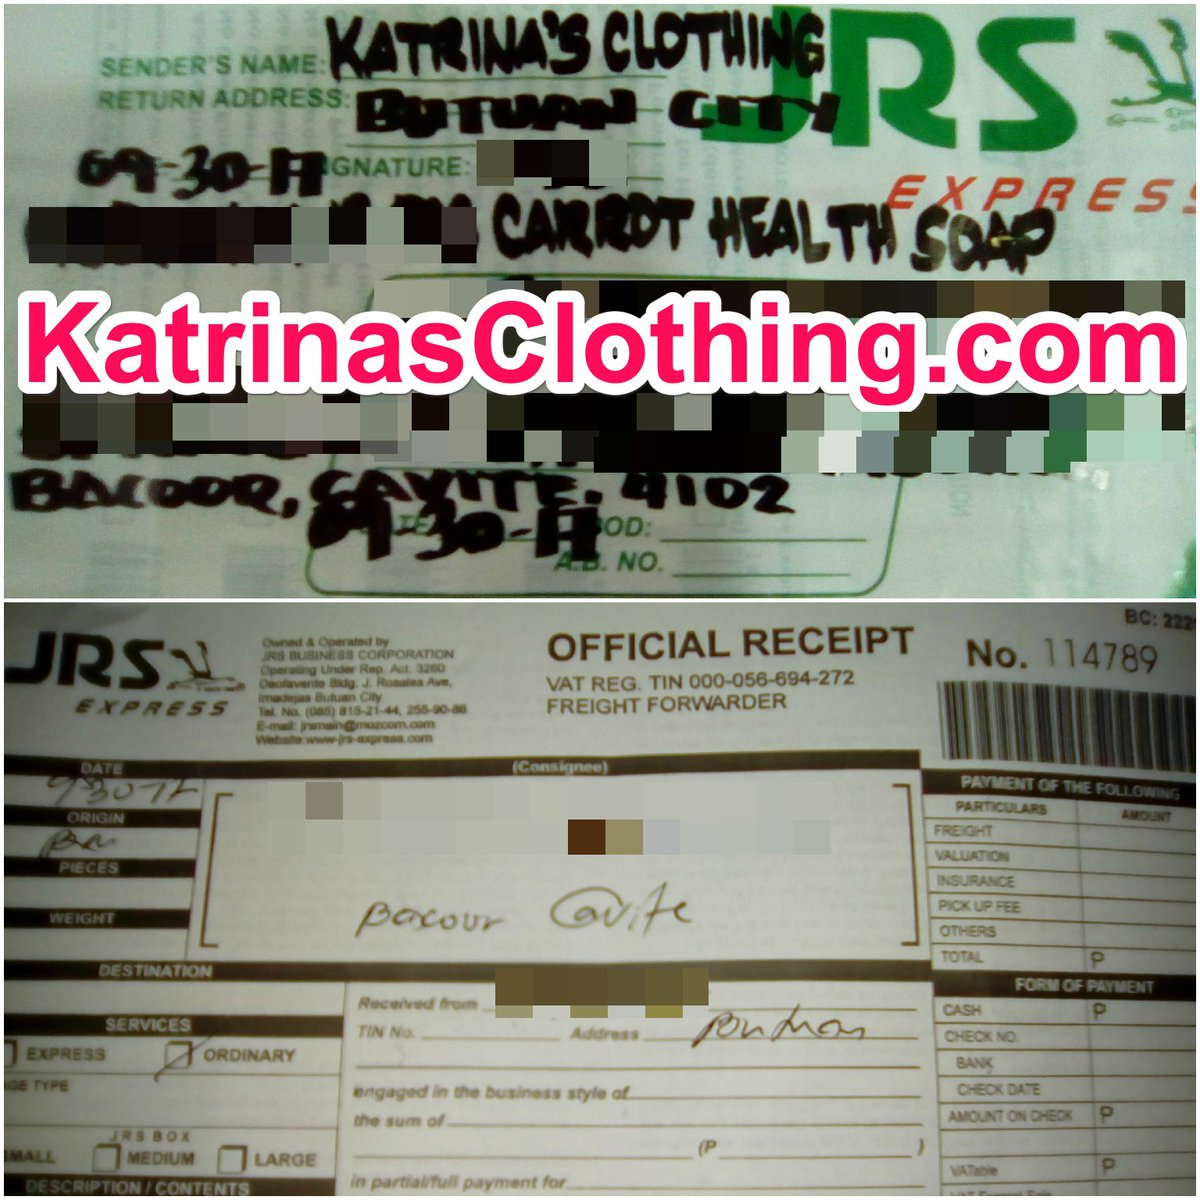 Philippines clothing brand